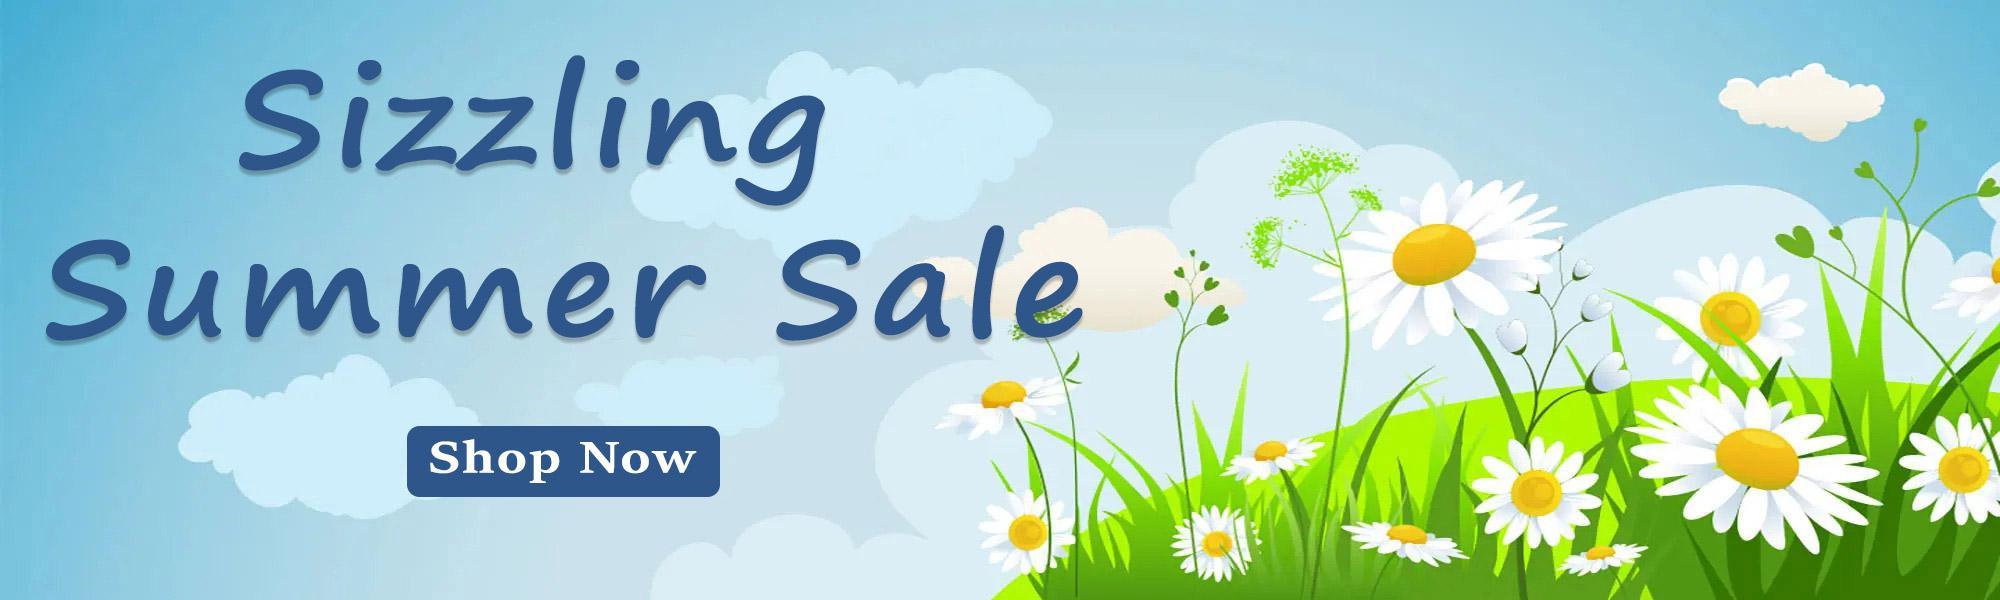 Sizzling Summer Sale Event - Shop Now